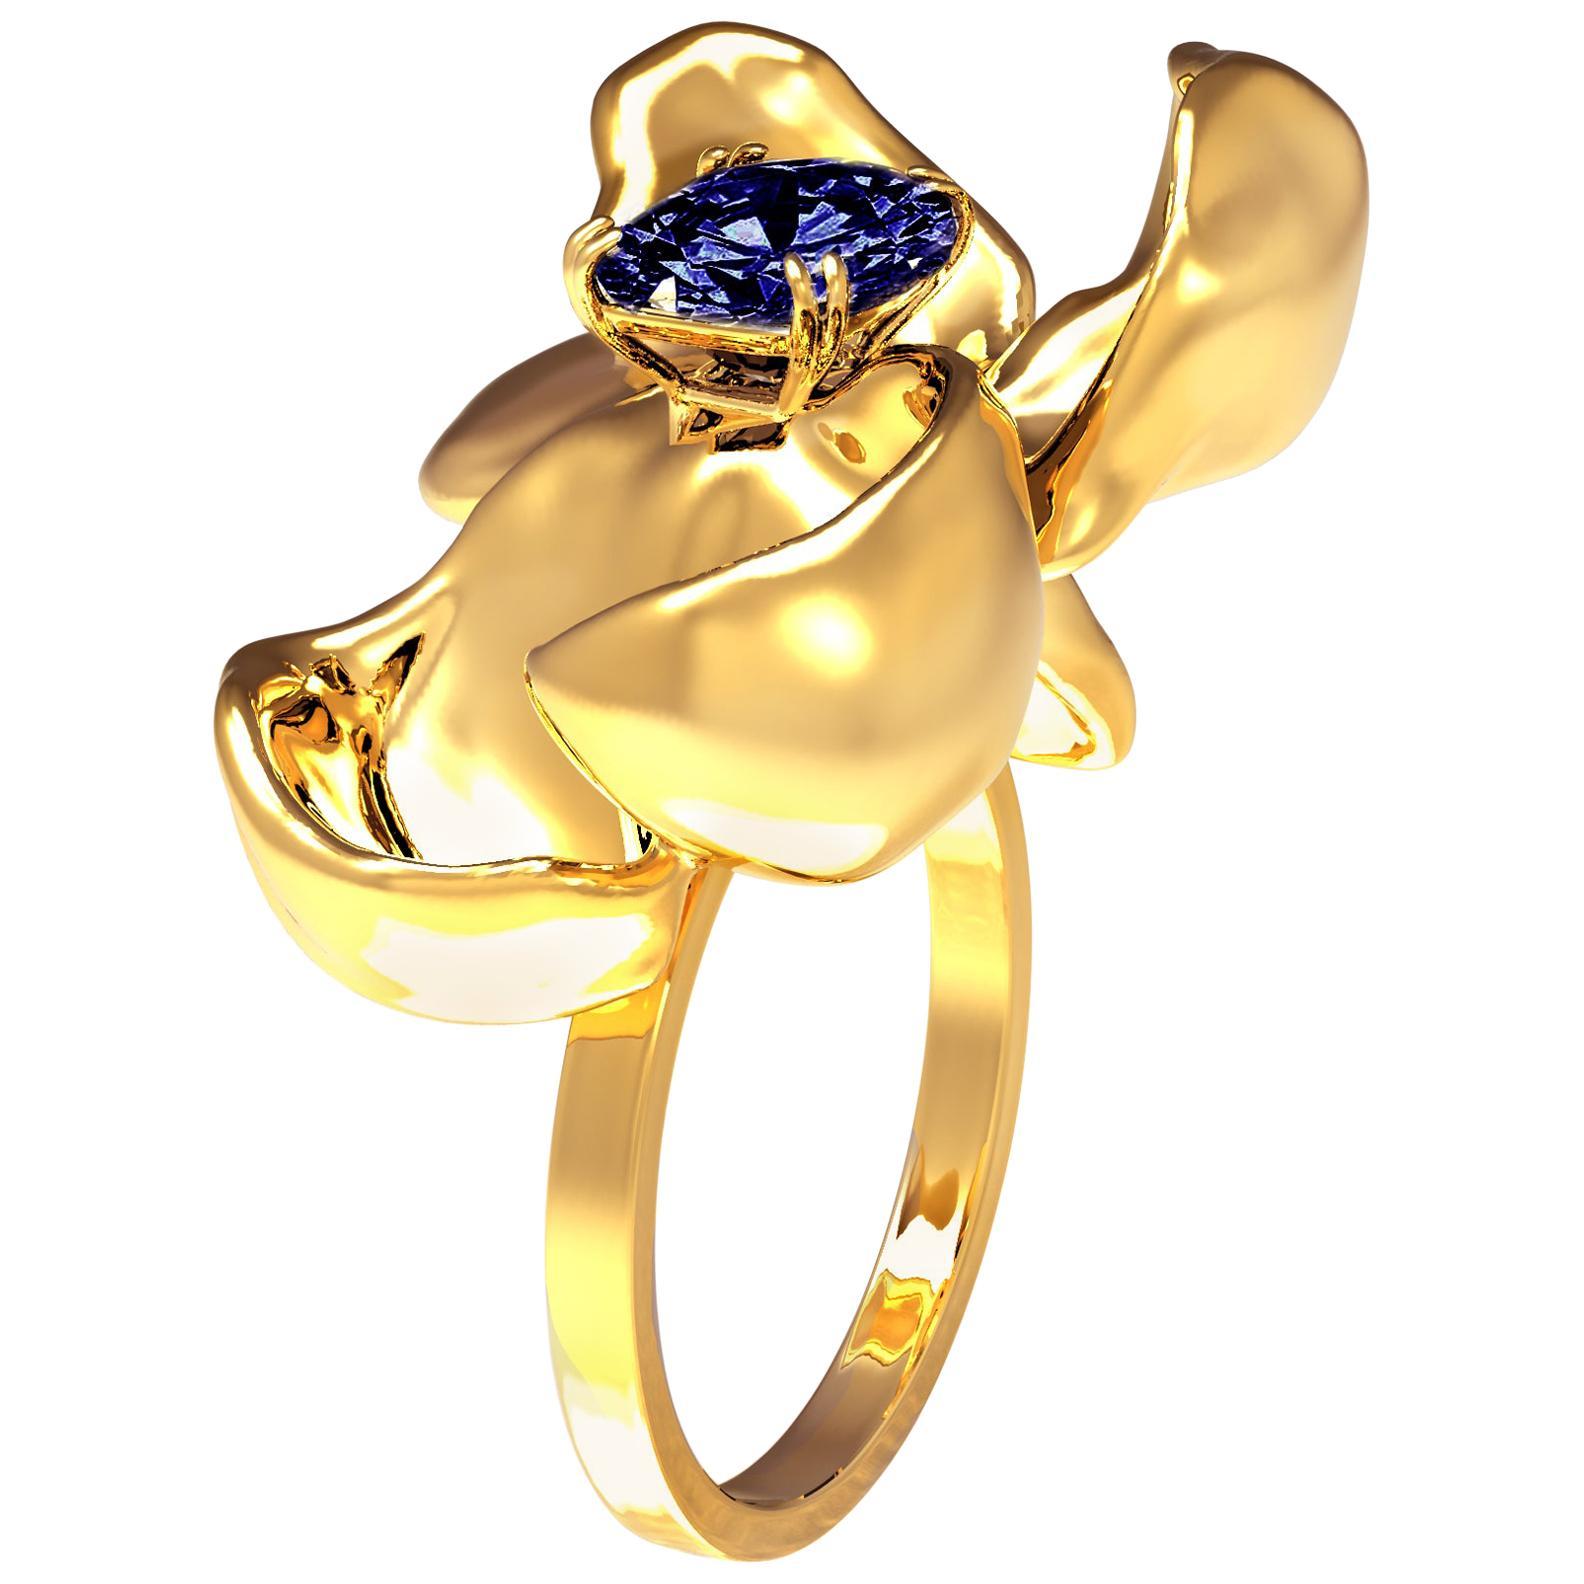 18 Karat Yellow Gold GRS Certified No Heat Royal Blue Sapphire Contemporary Ring